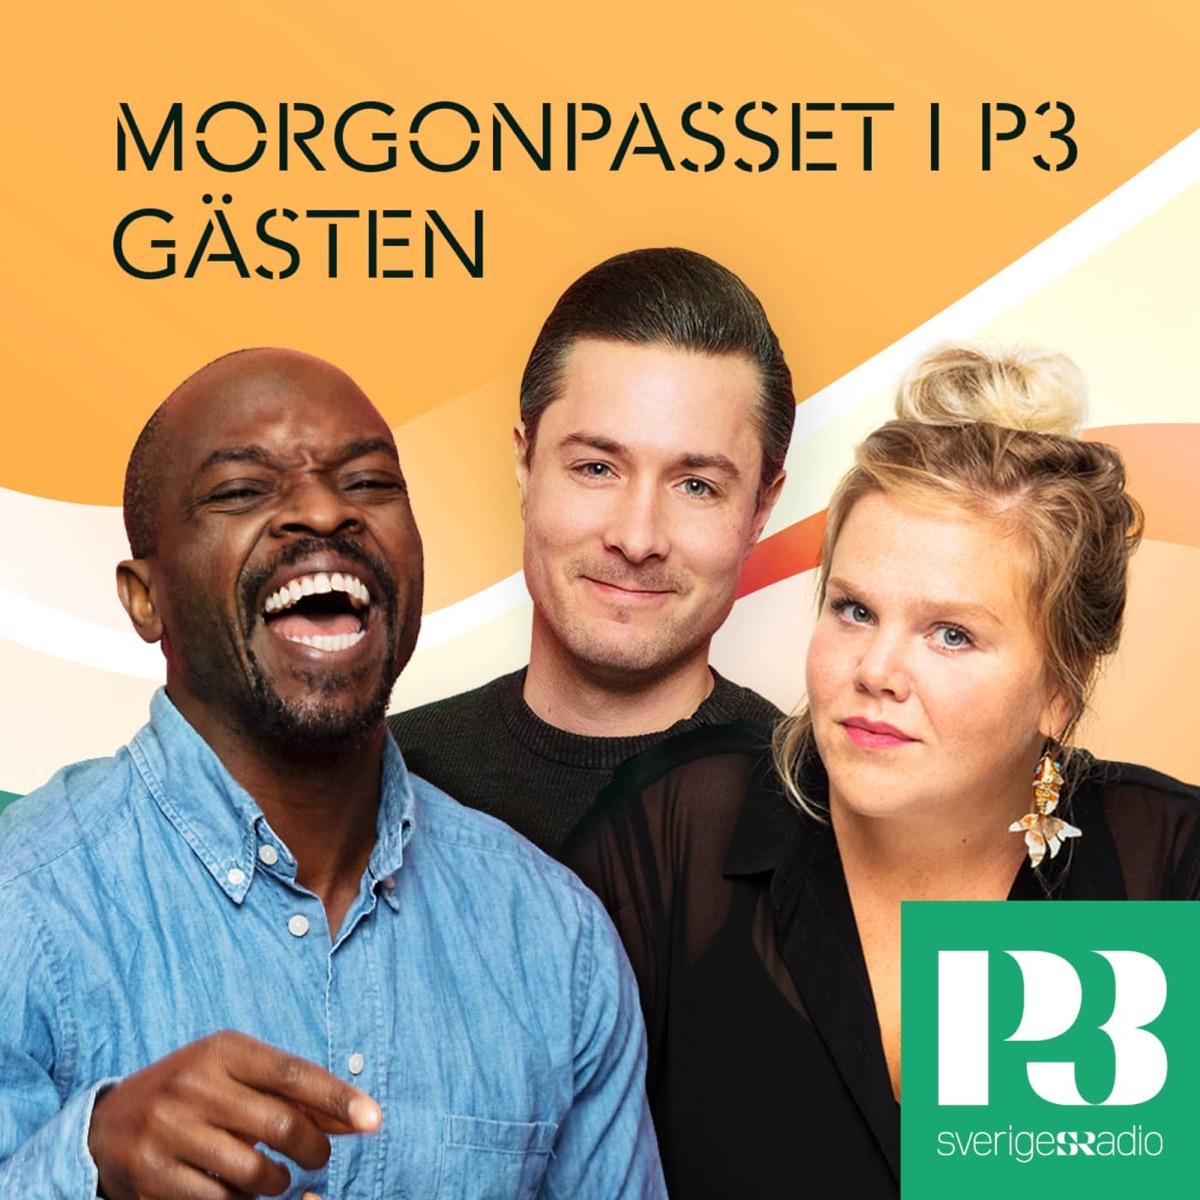 Morgonpasset i P3 – Gästen